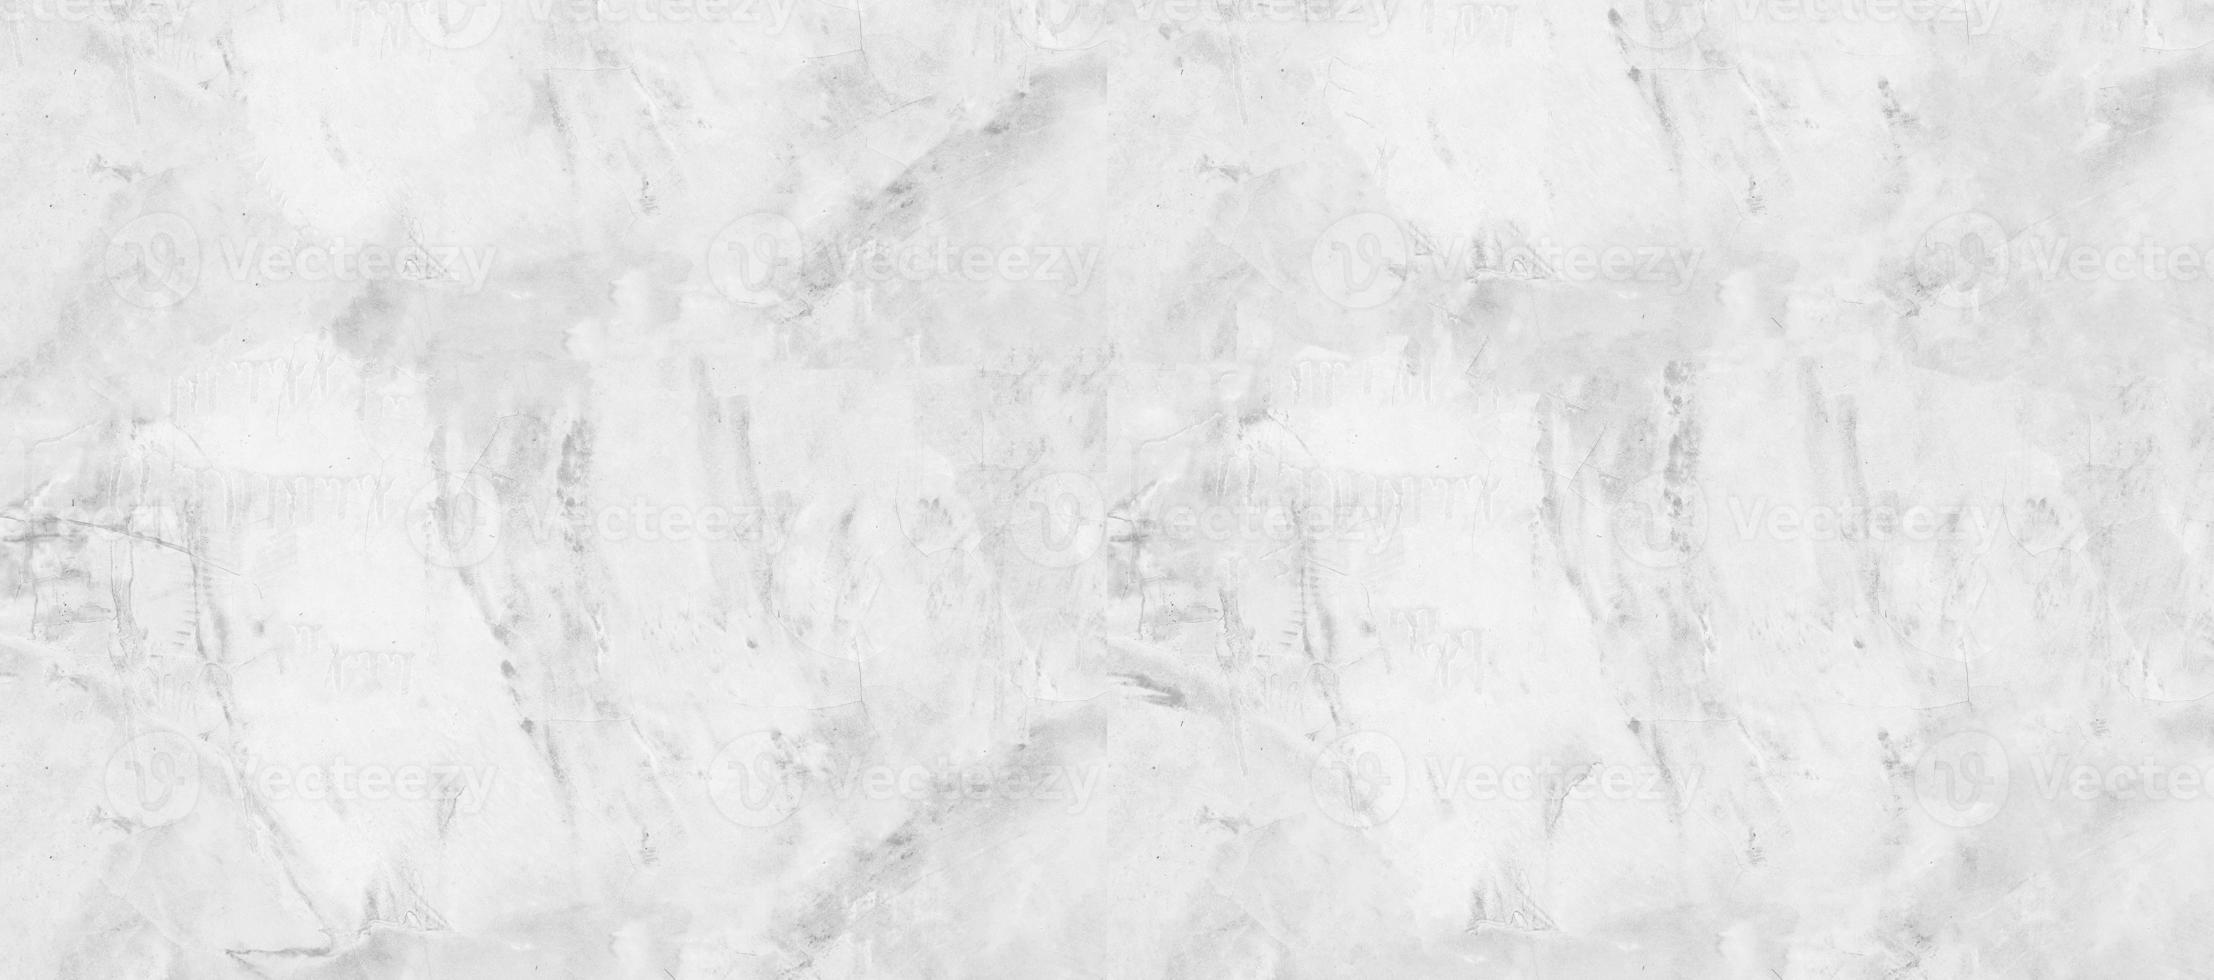 textura de parede de concreto branco para o fundo foto